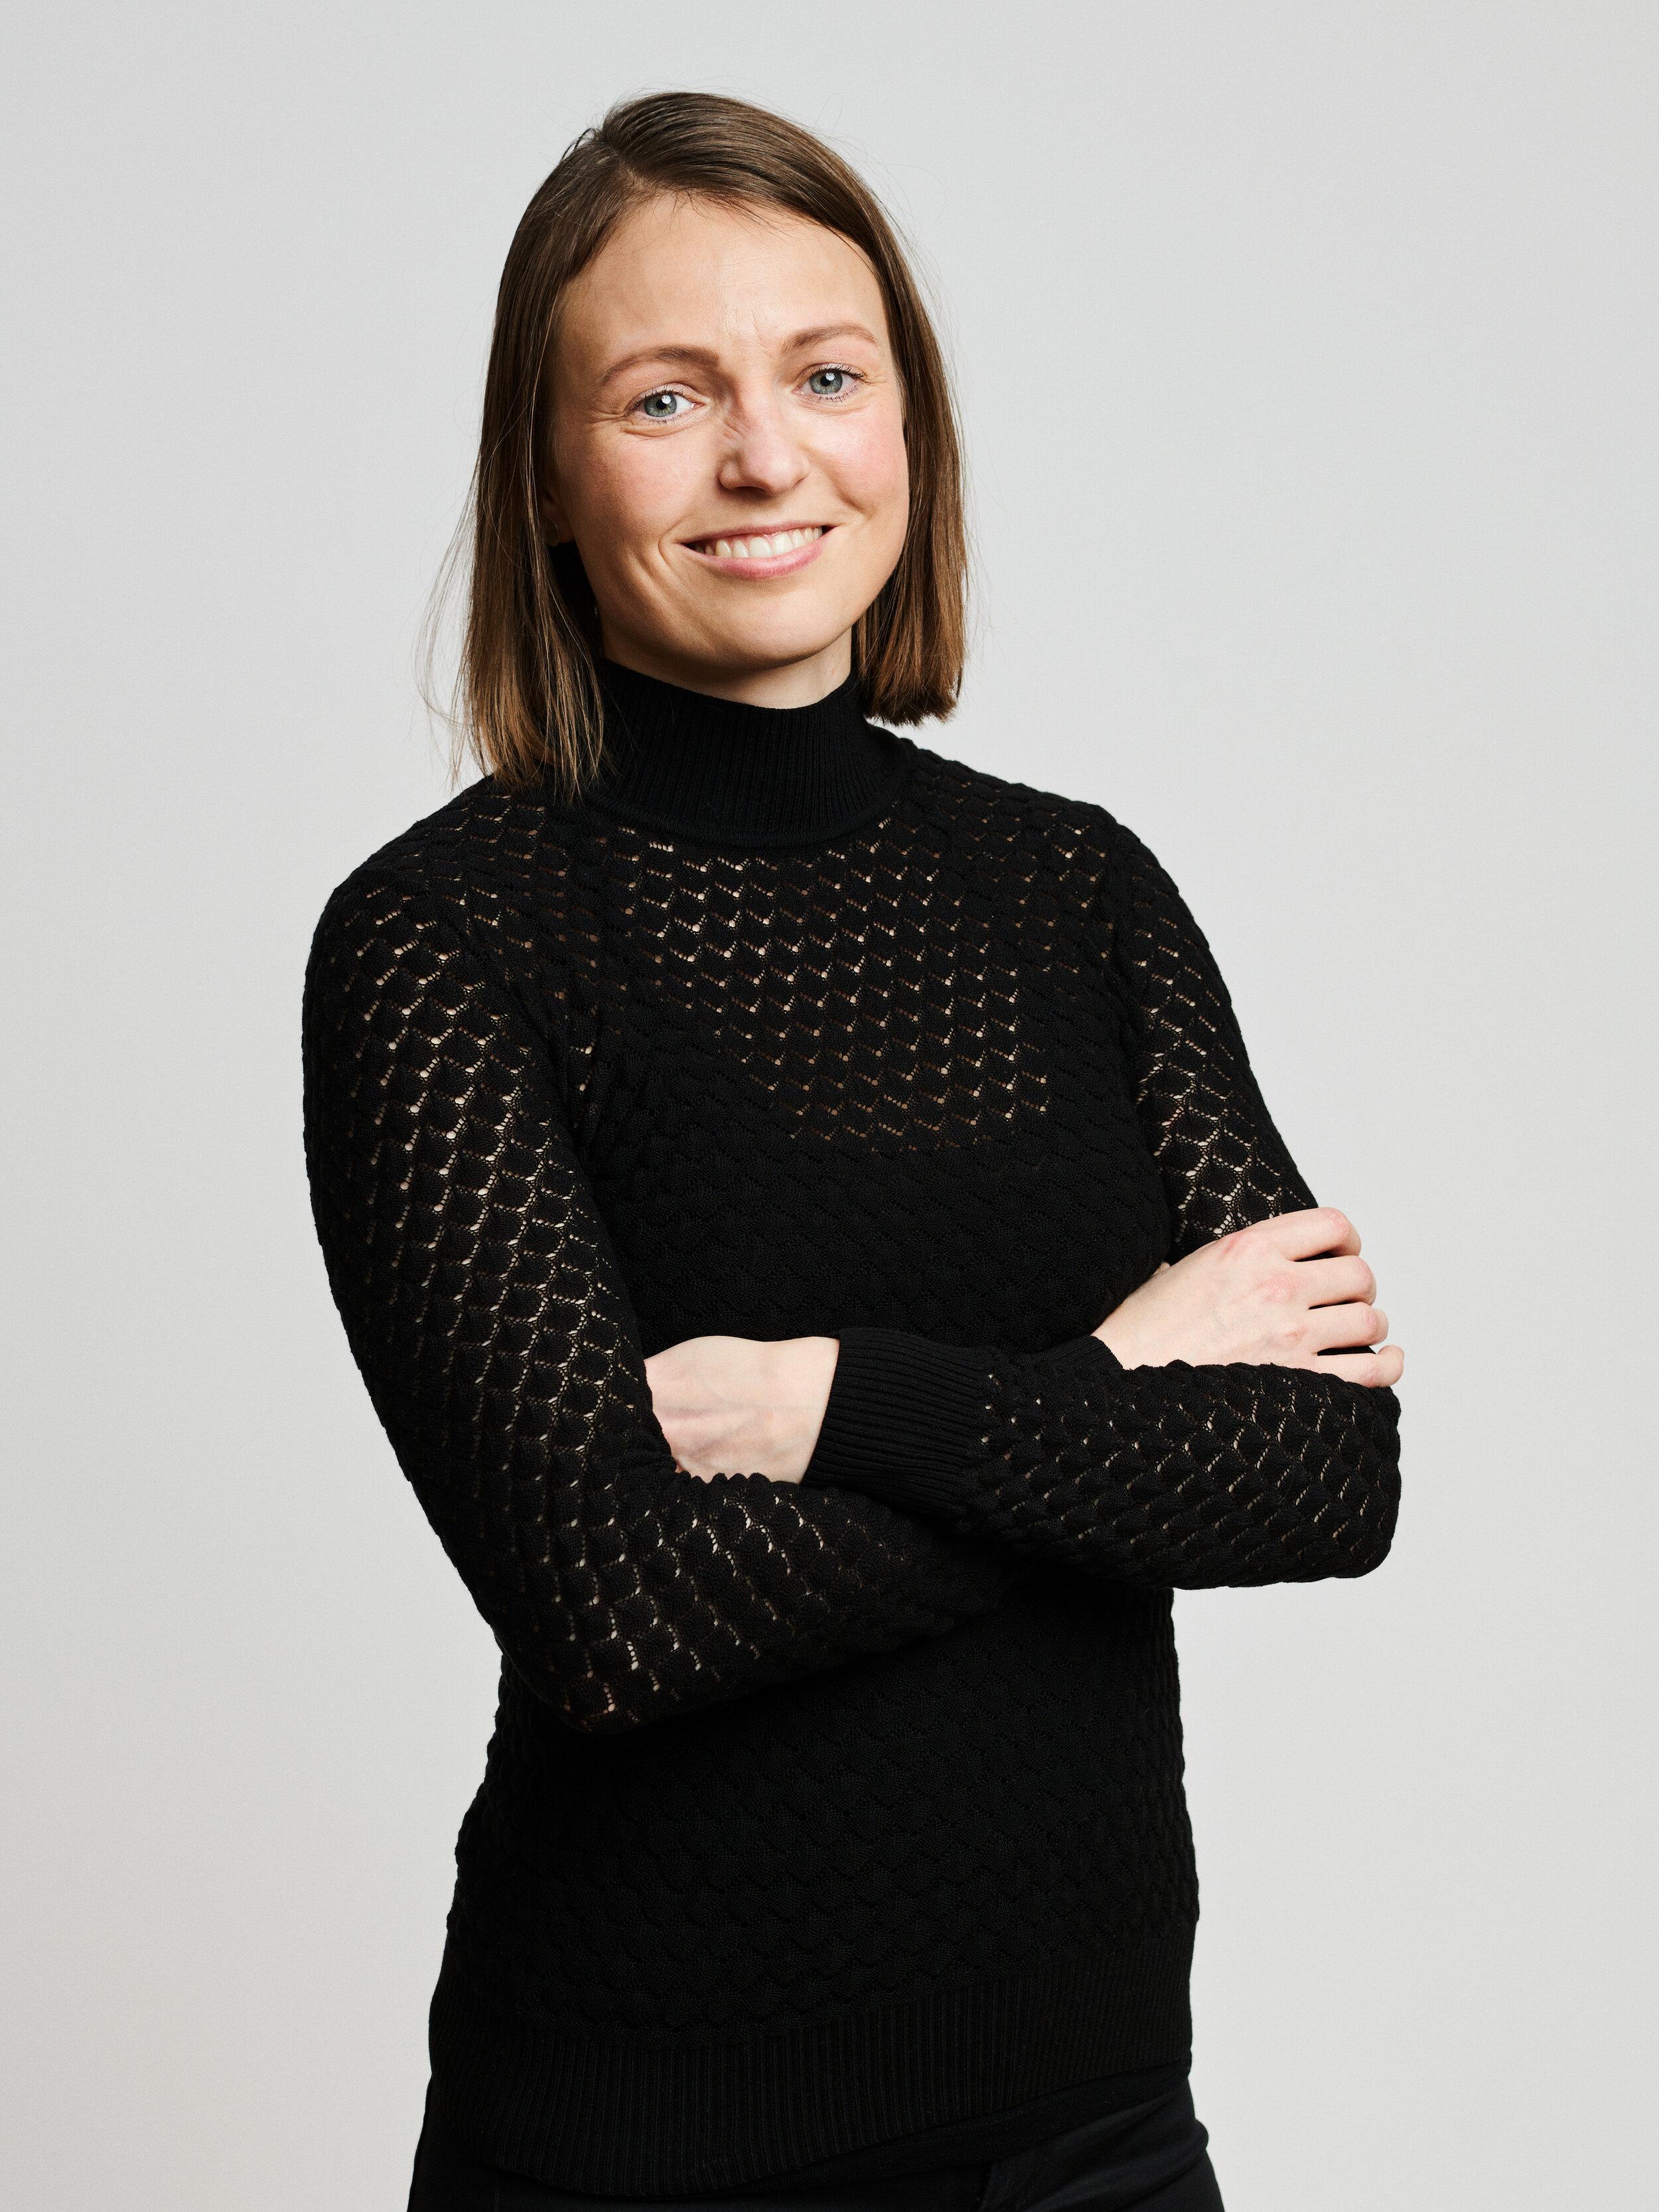 Anne Gyldendal.jpg